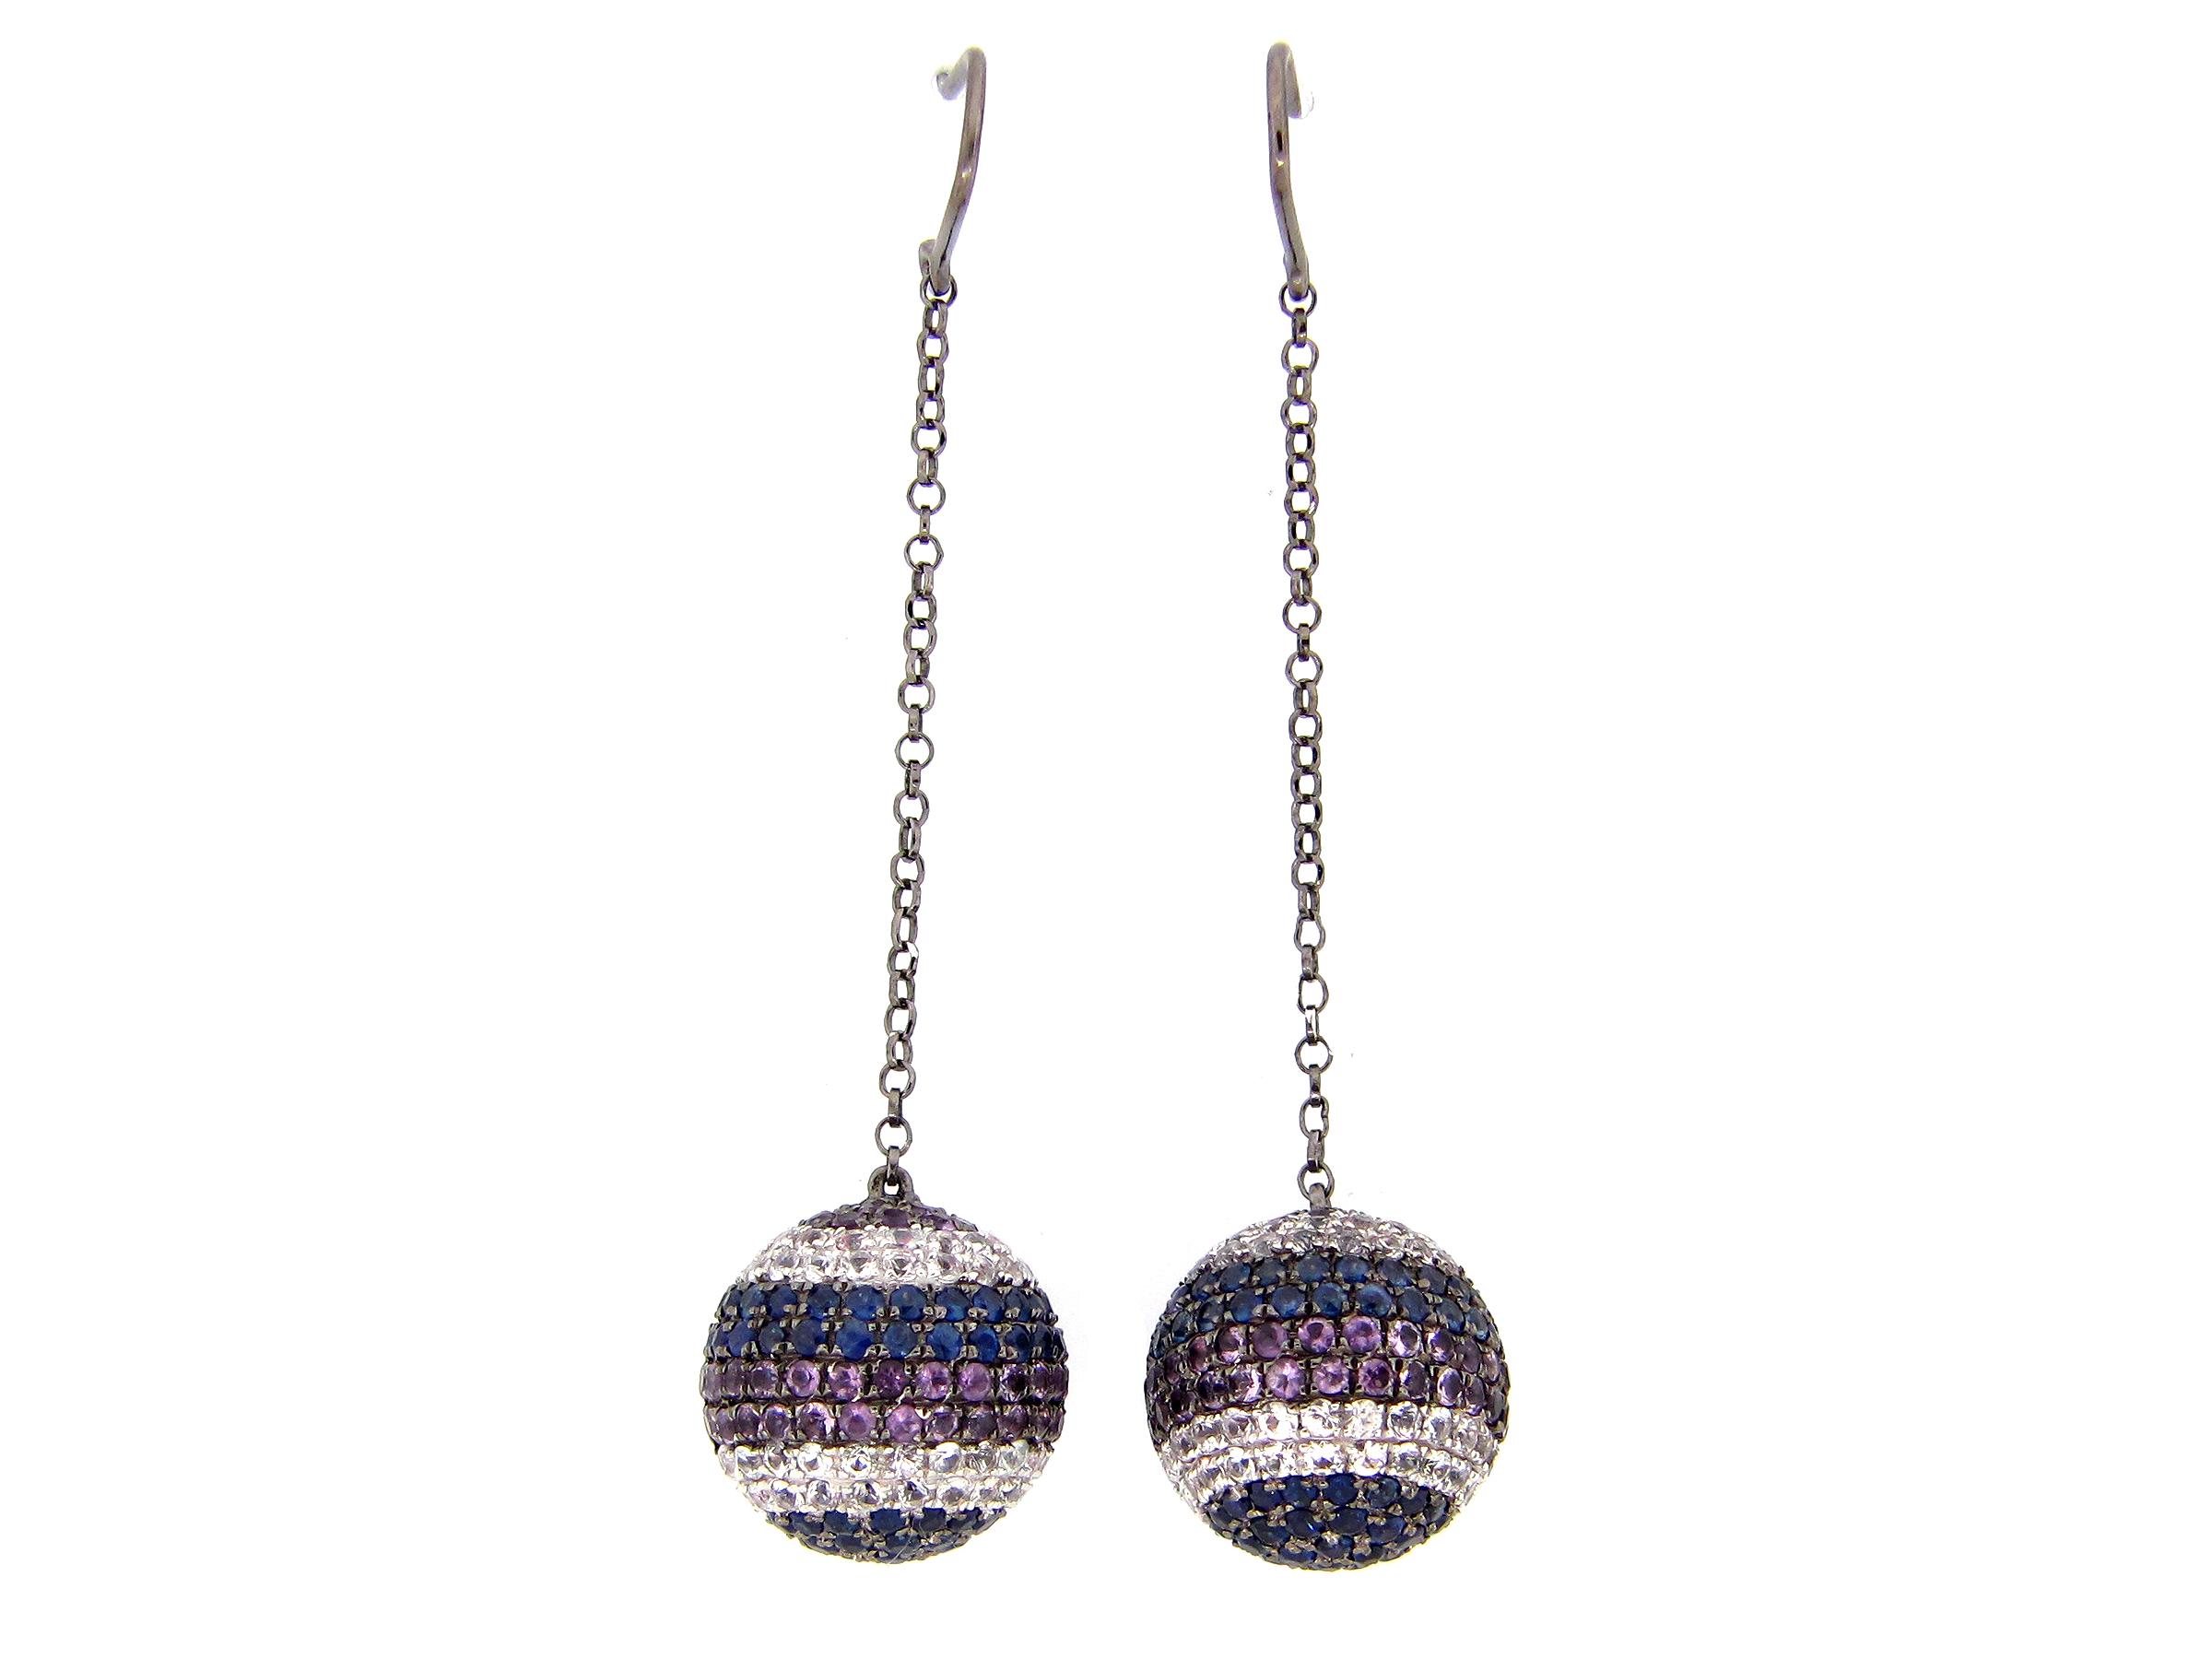 Sapphire Ball Earrings